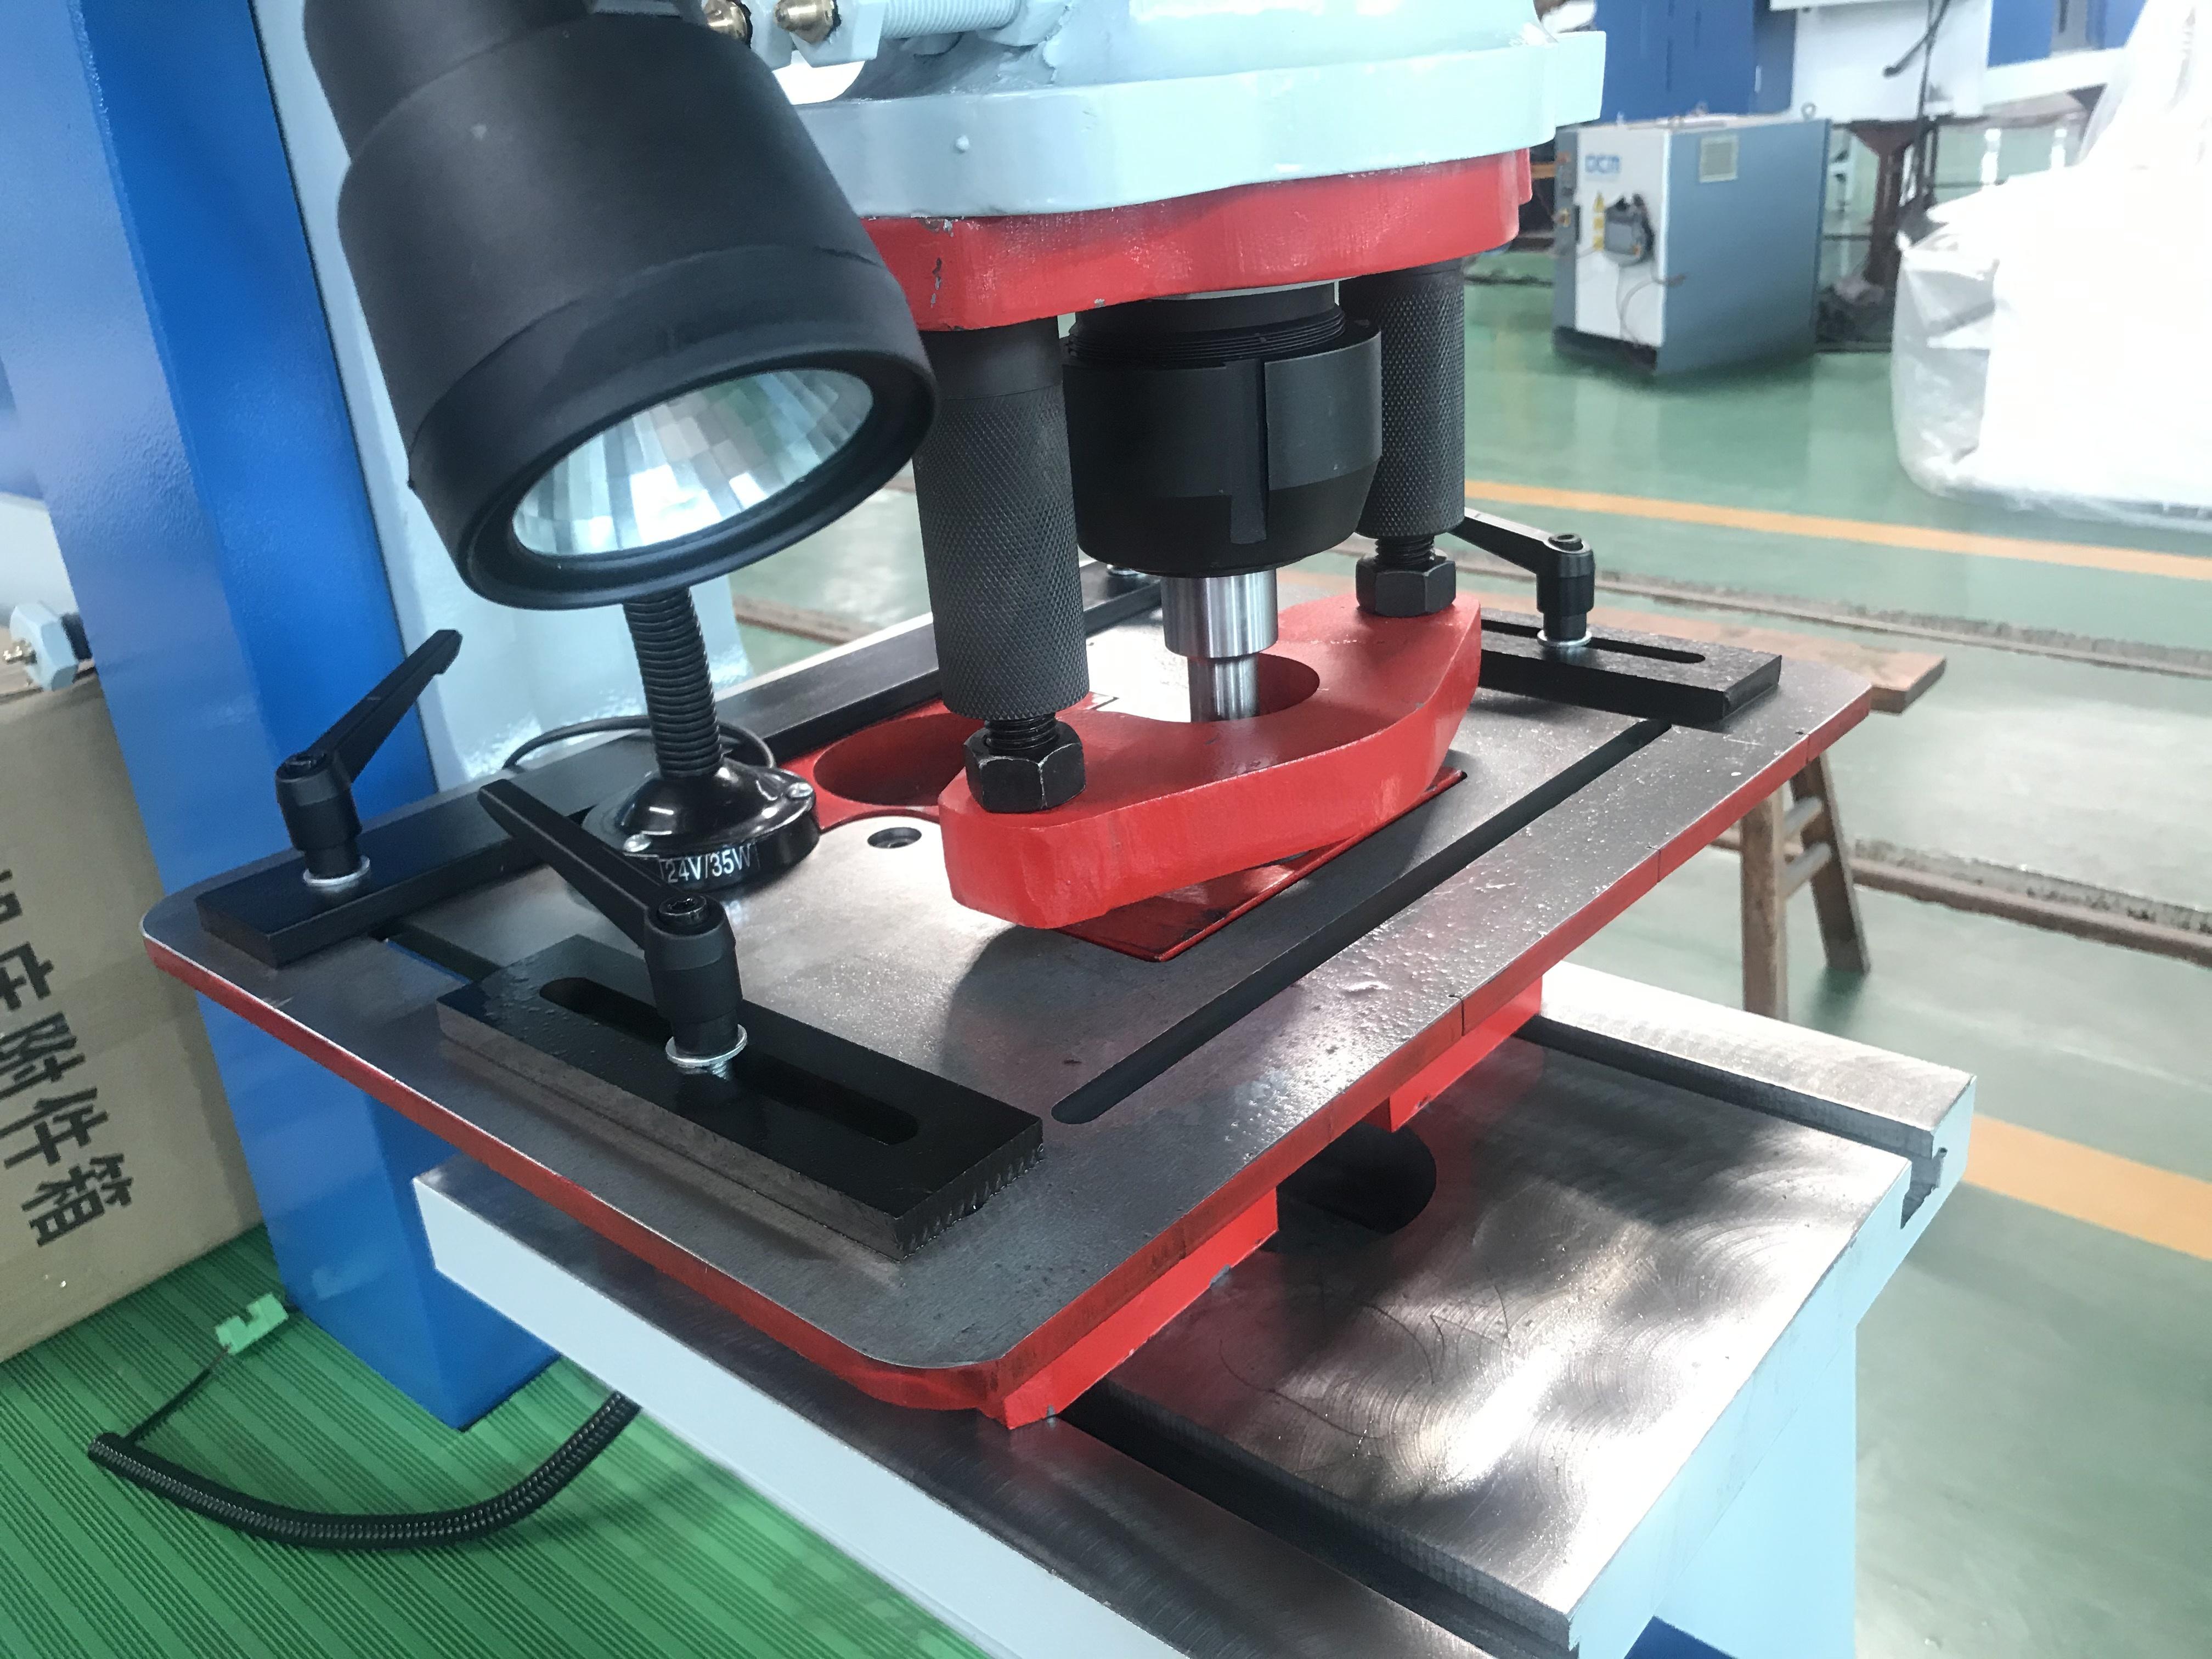 Metal Multifunctional Hydraulic Ironworker Machine with Bending Shearing and Punching